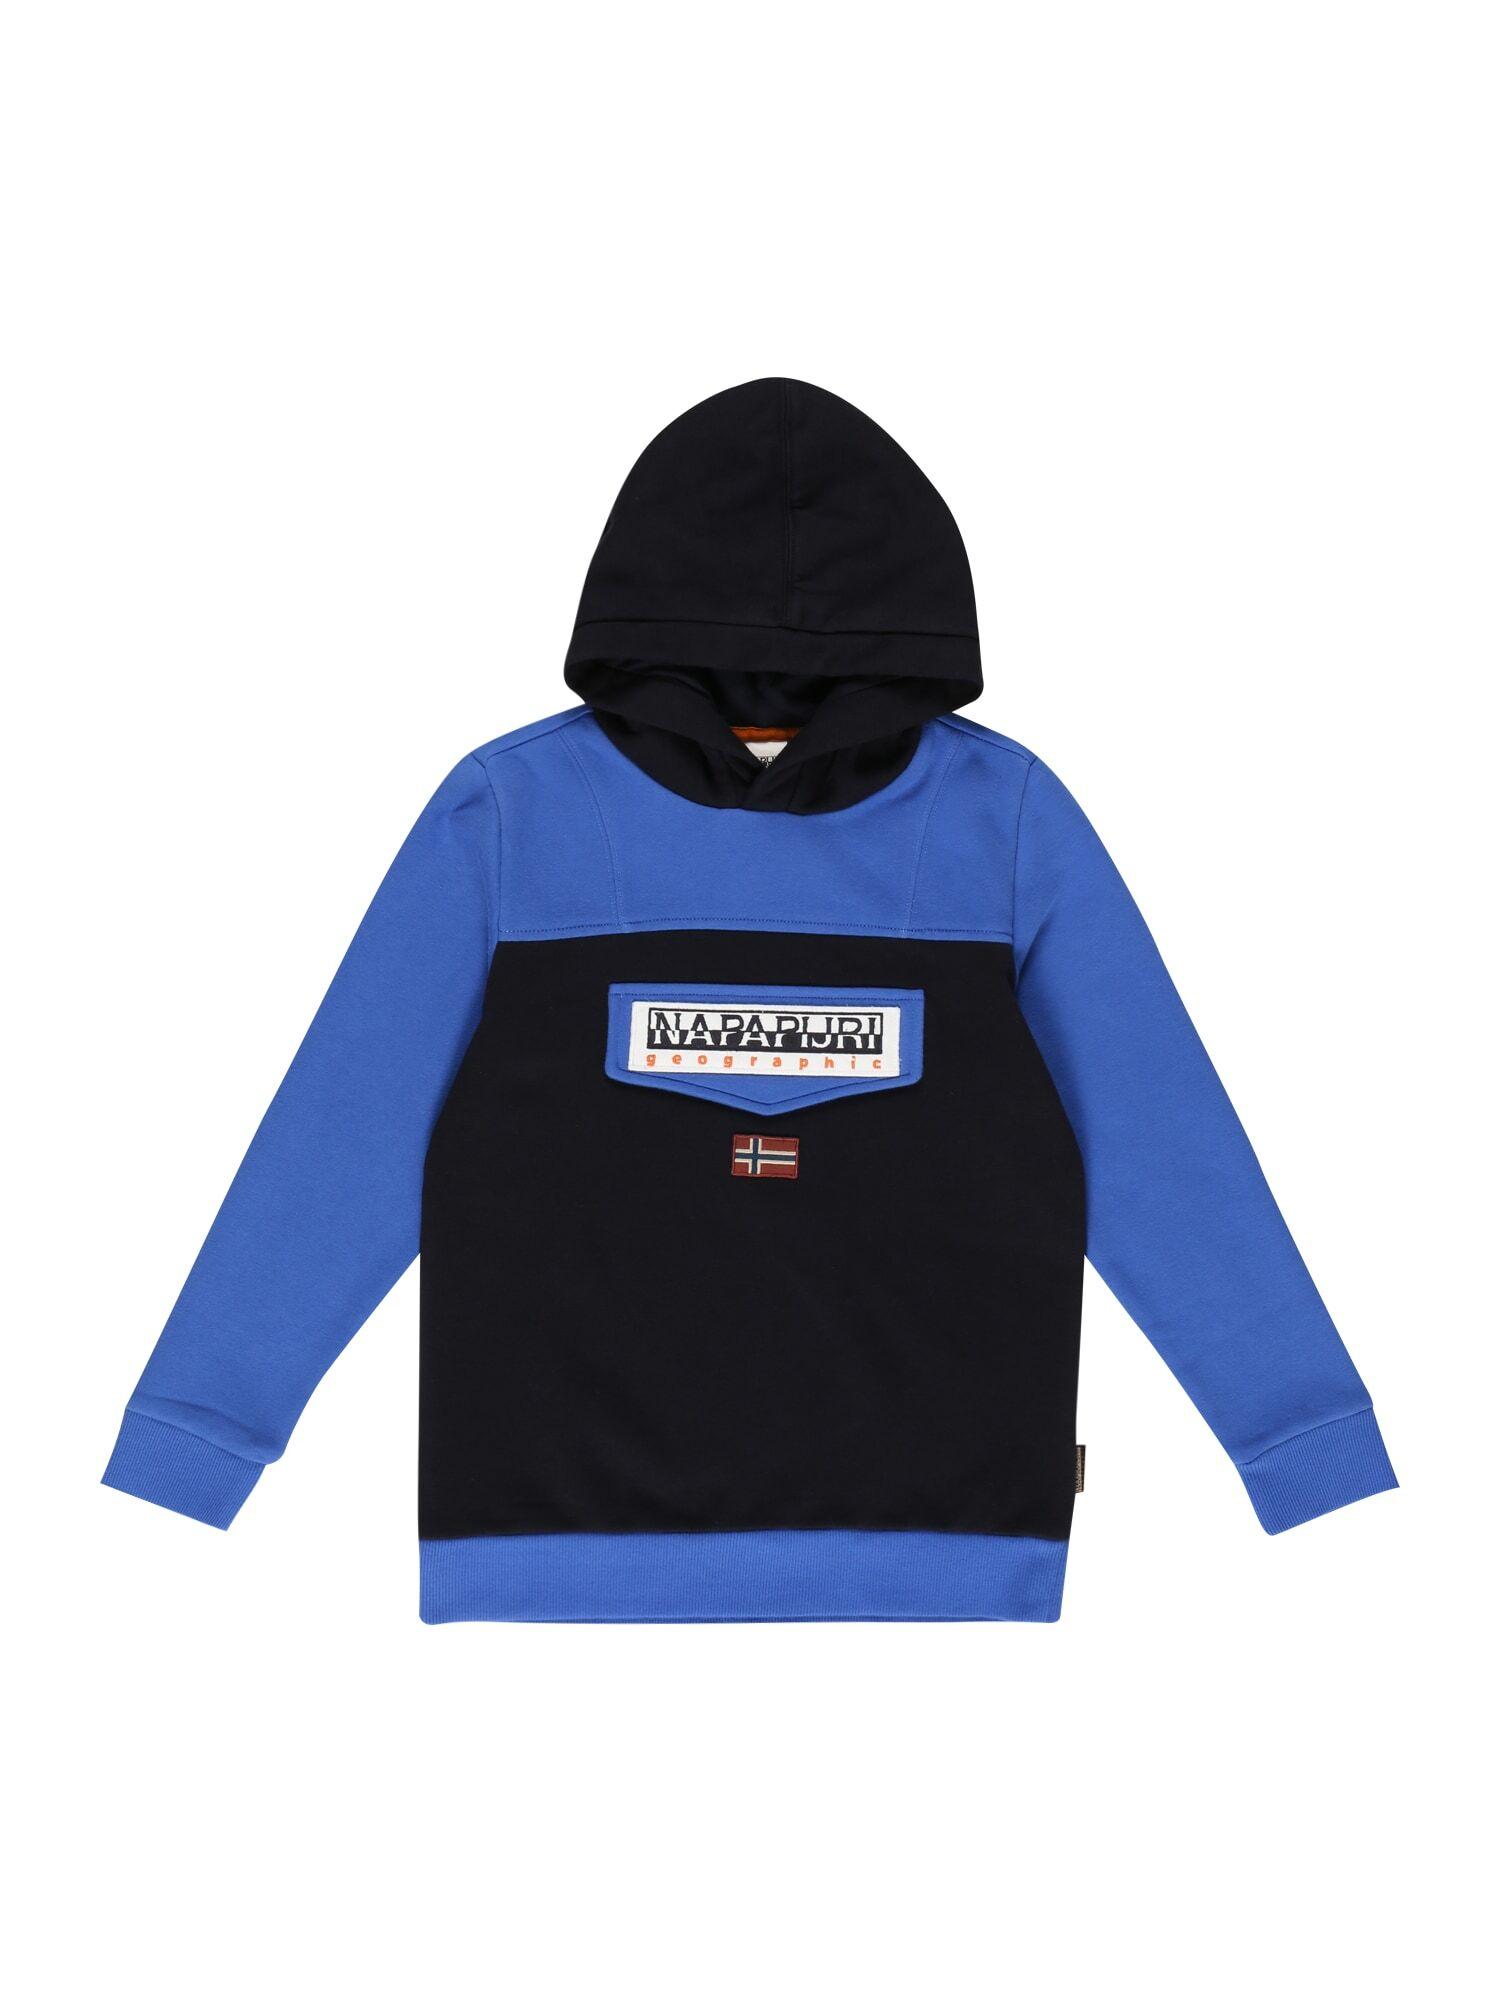 NAPAPIJRI Sweat-shirt 'BURGEE'  - Bleu - Taille: 16 - girl